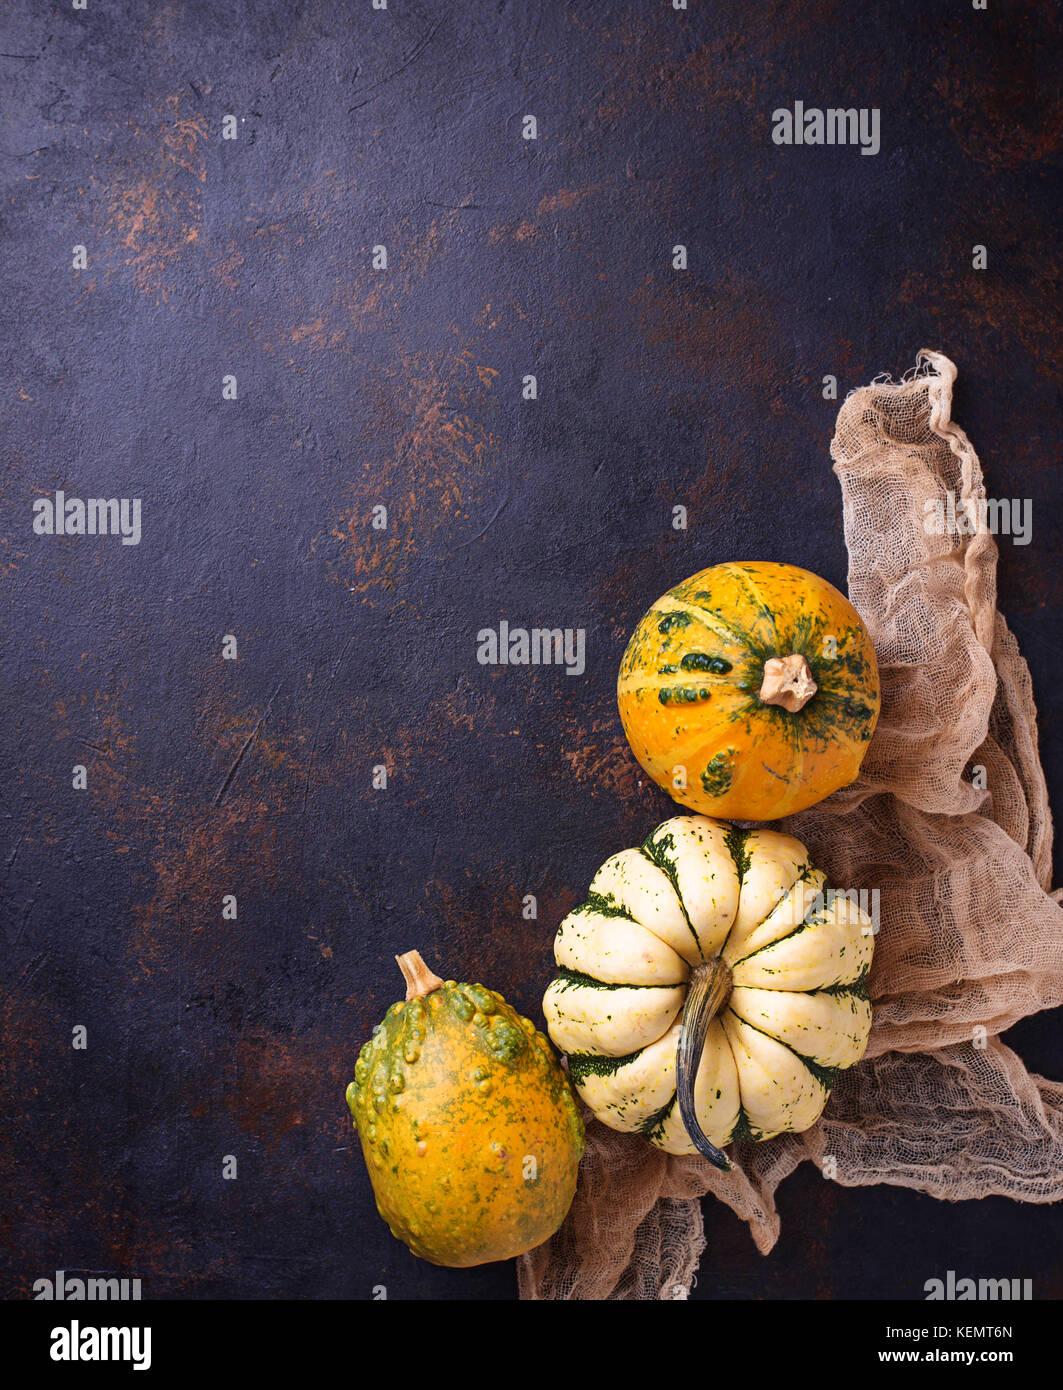 Decorative pumpkins on rusty background  - Stock Image